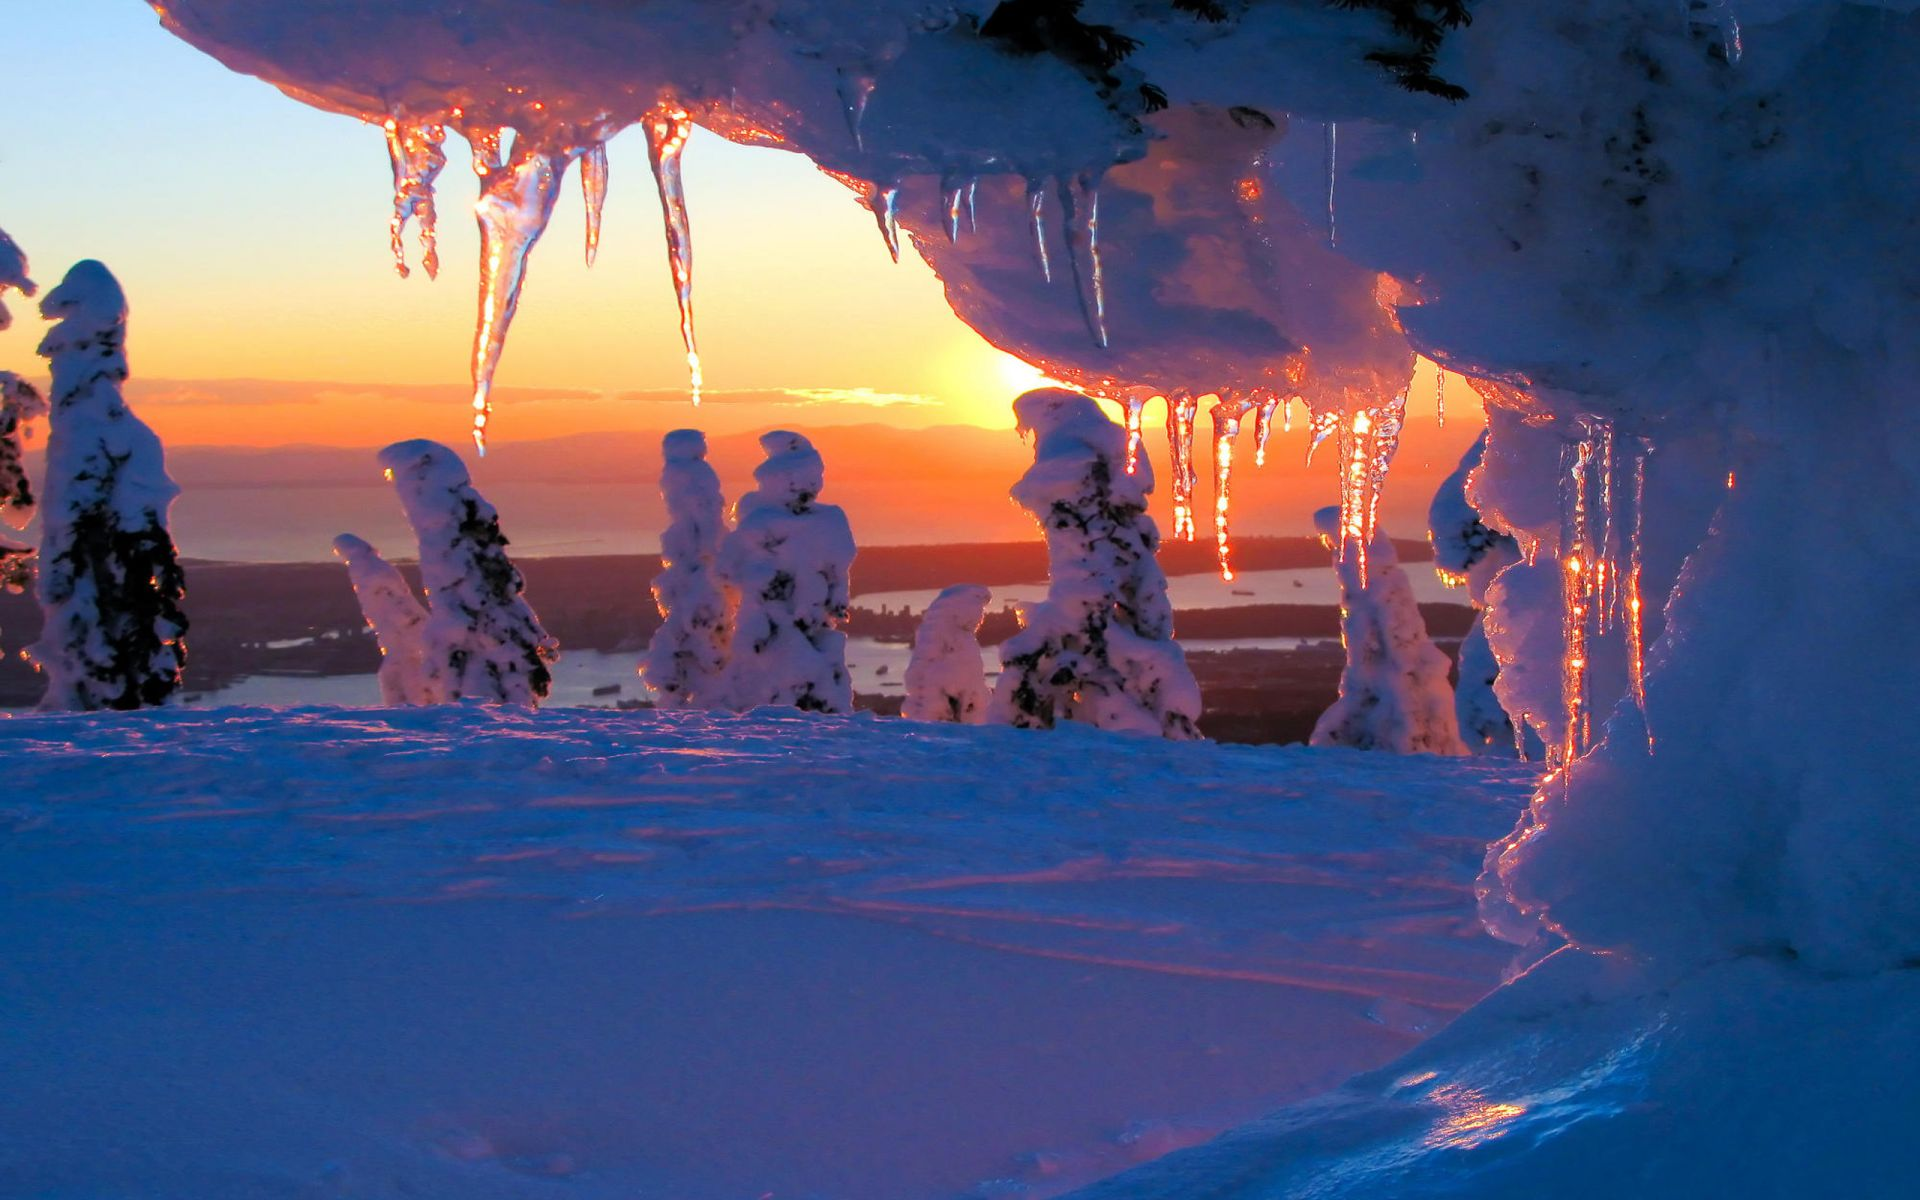 winter scenery 33758